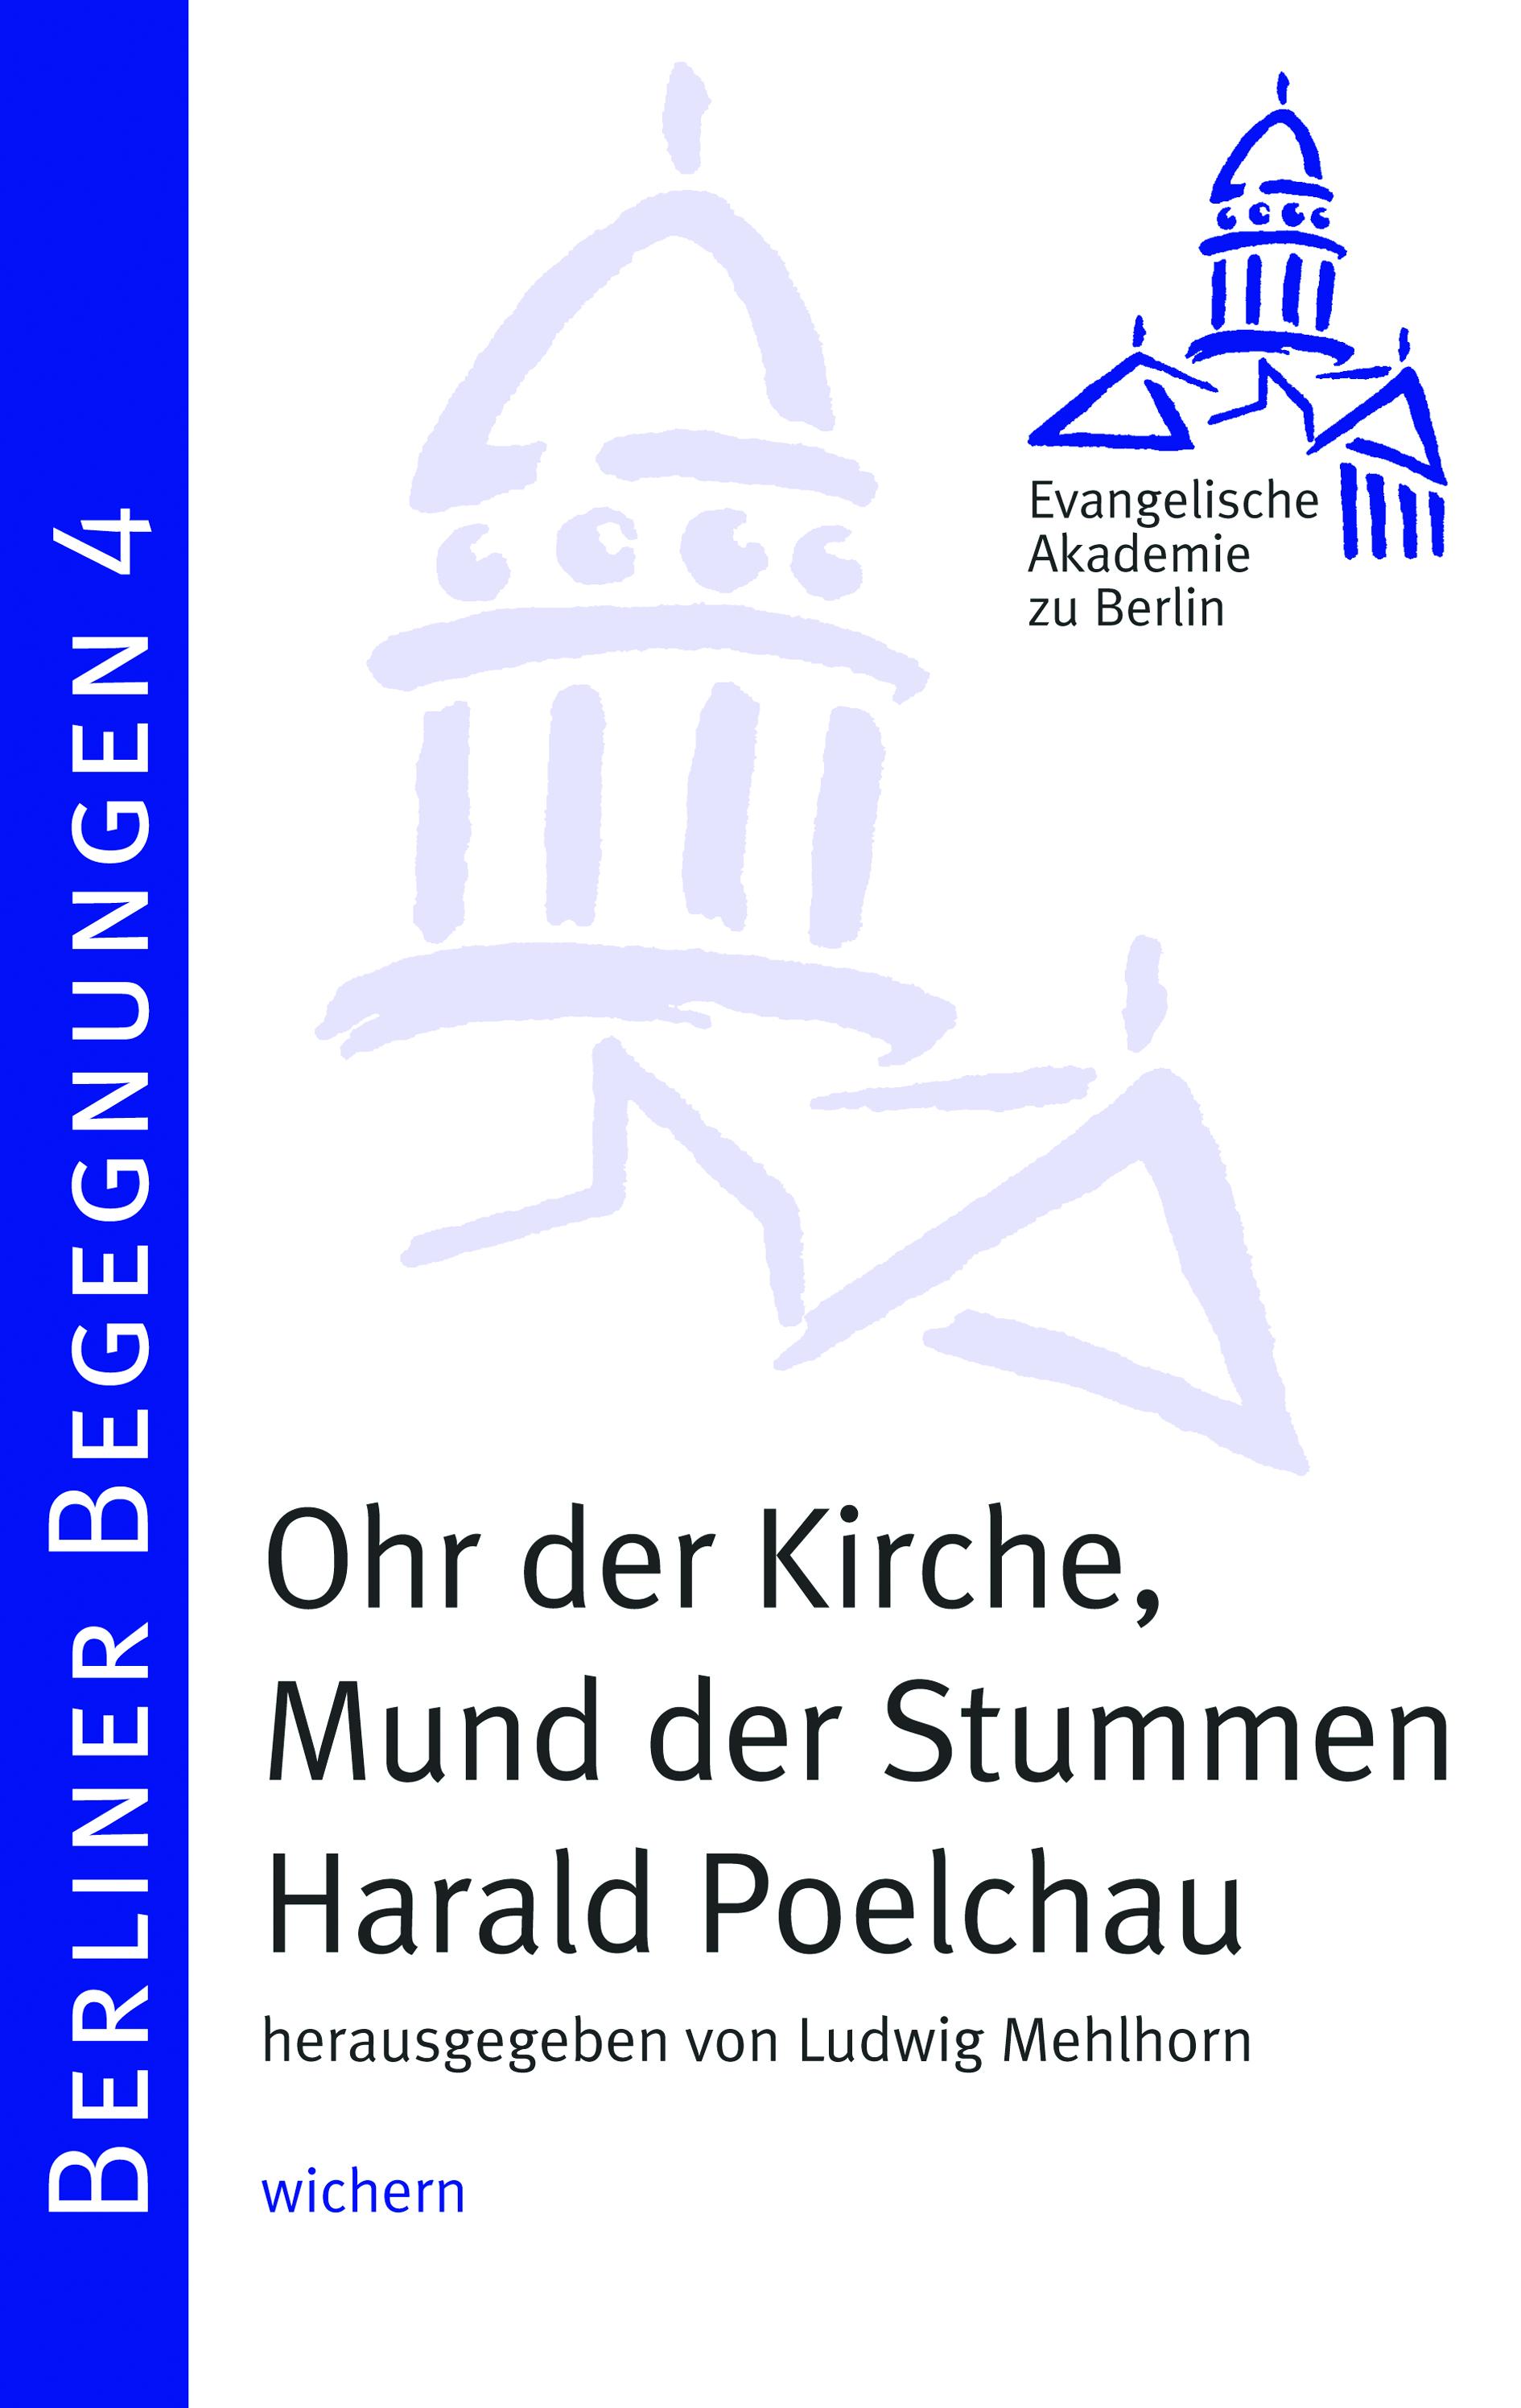 Harald Poelchau Gefängnispfarrer